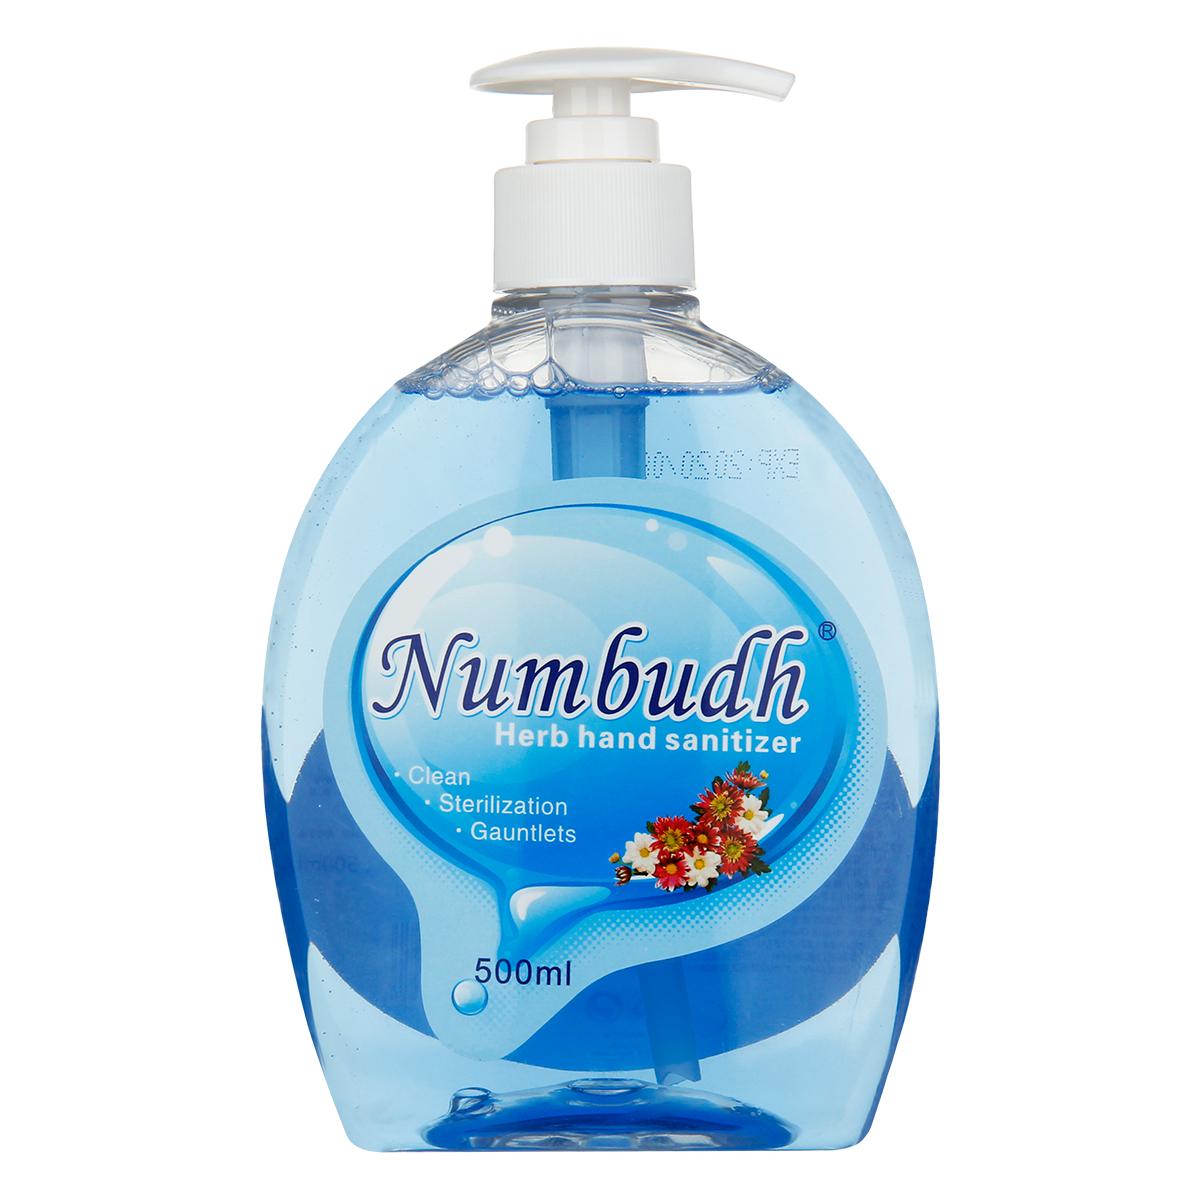 Original imported numbudh Nanpu hand sanitizer moisturizing, softening skin, moisturizing, antibacterial, disinfecting and hand washing household Hotel